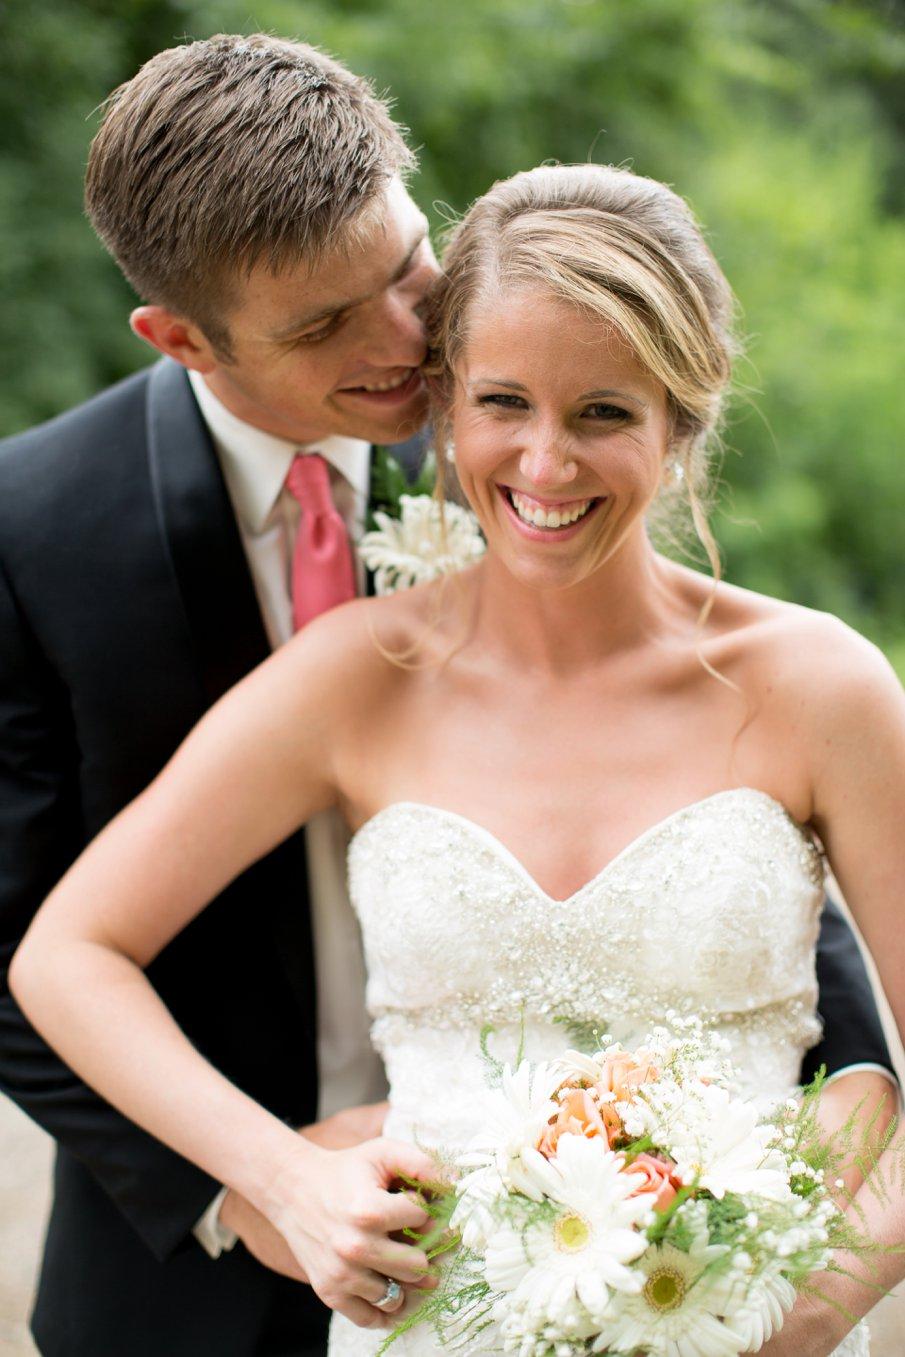 Alice Hq Photography |Courtney + Tyler Mankato MN Wedding14.jpg